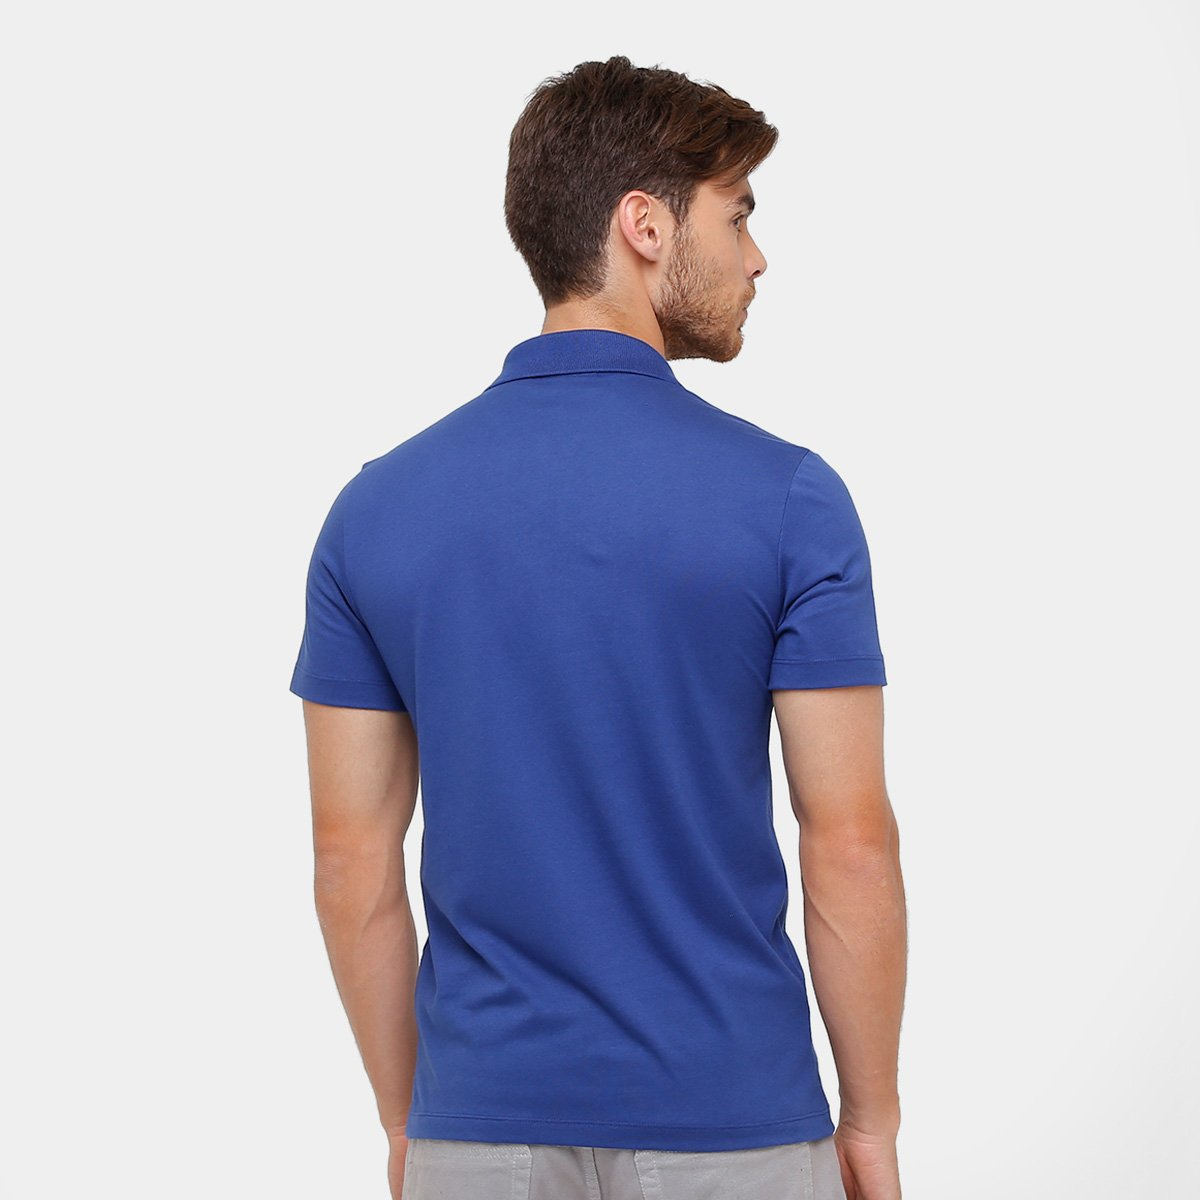 Camisa Polo Lacoste Malha Original Fit Masculina - Azul Escuro ... 40c3f2c955